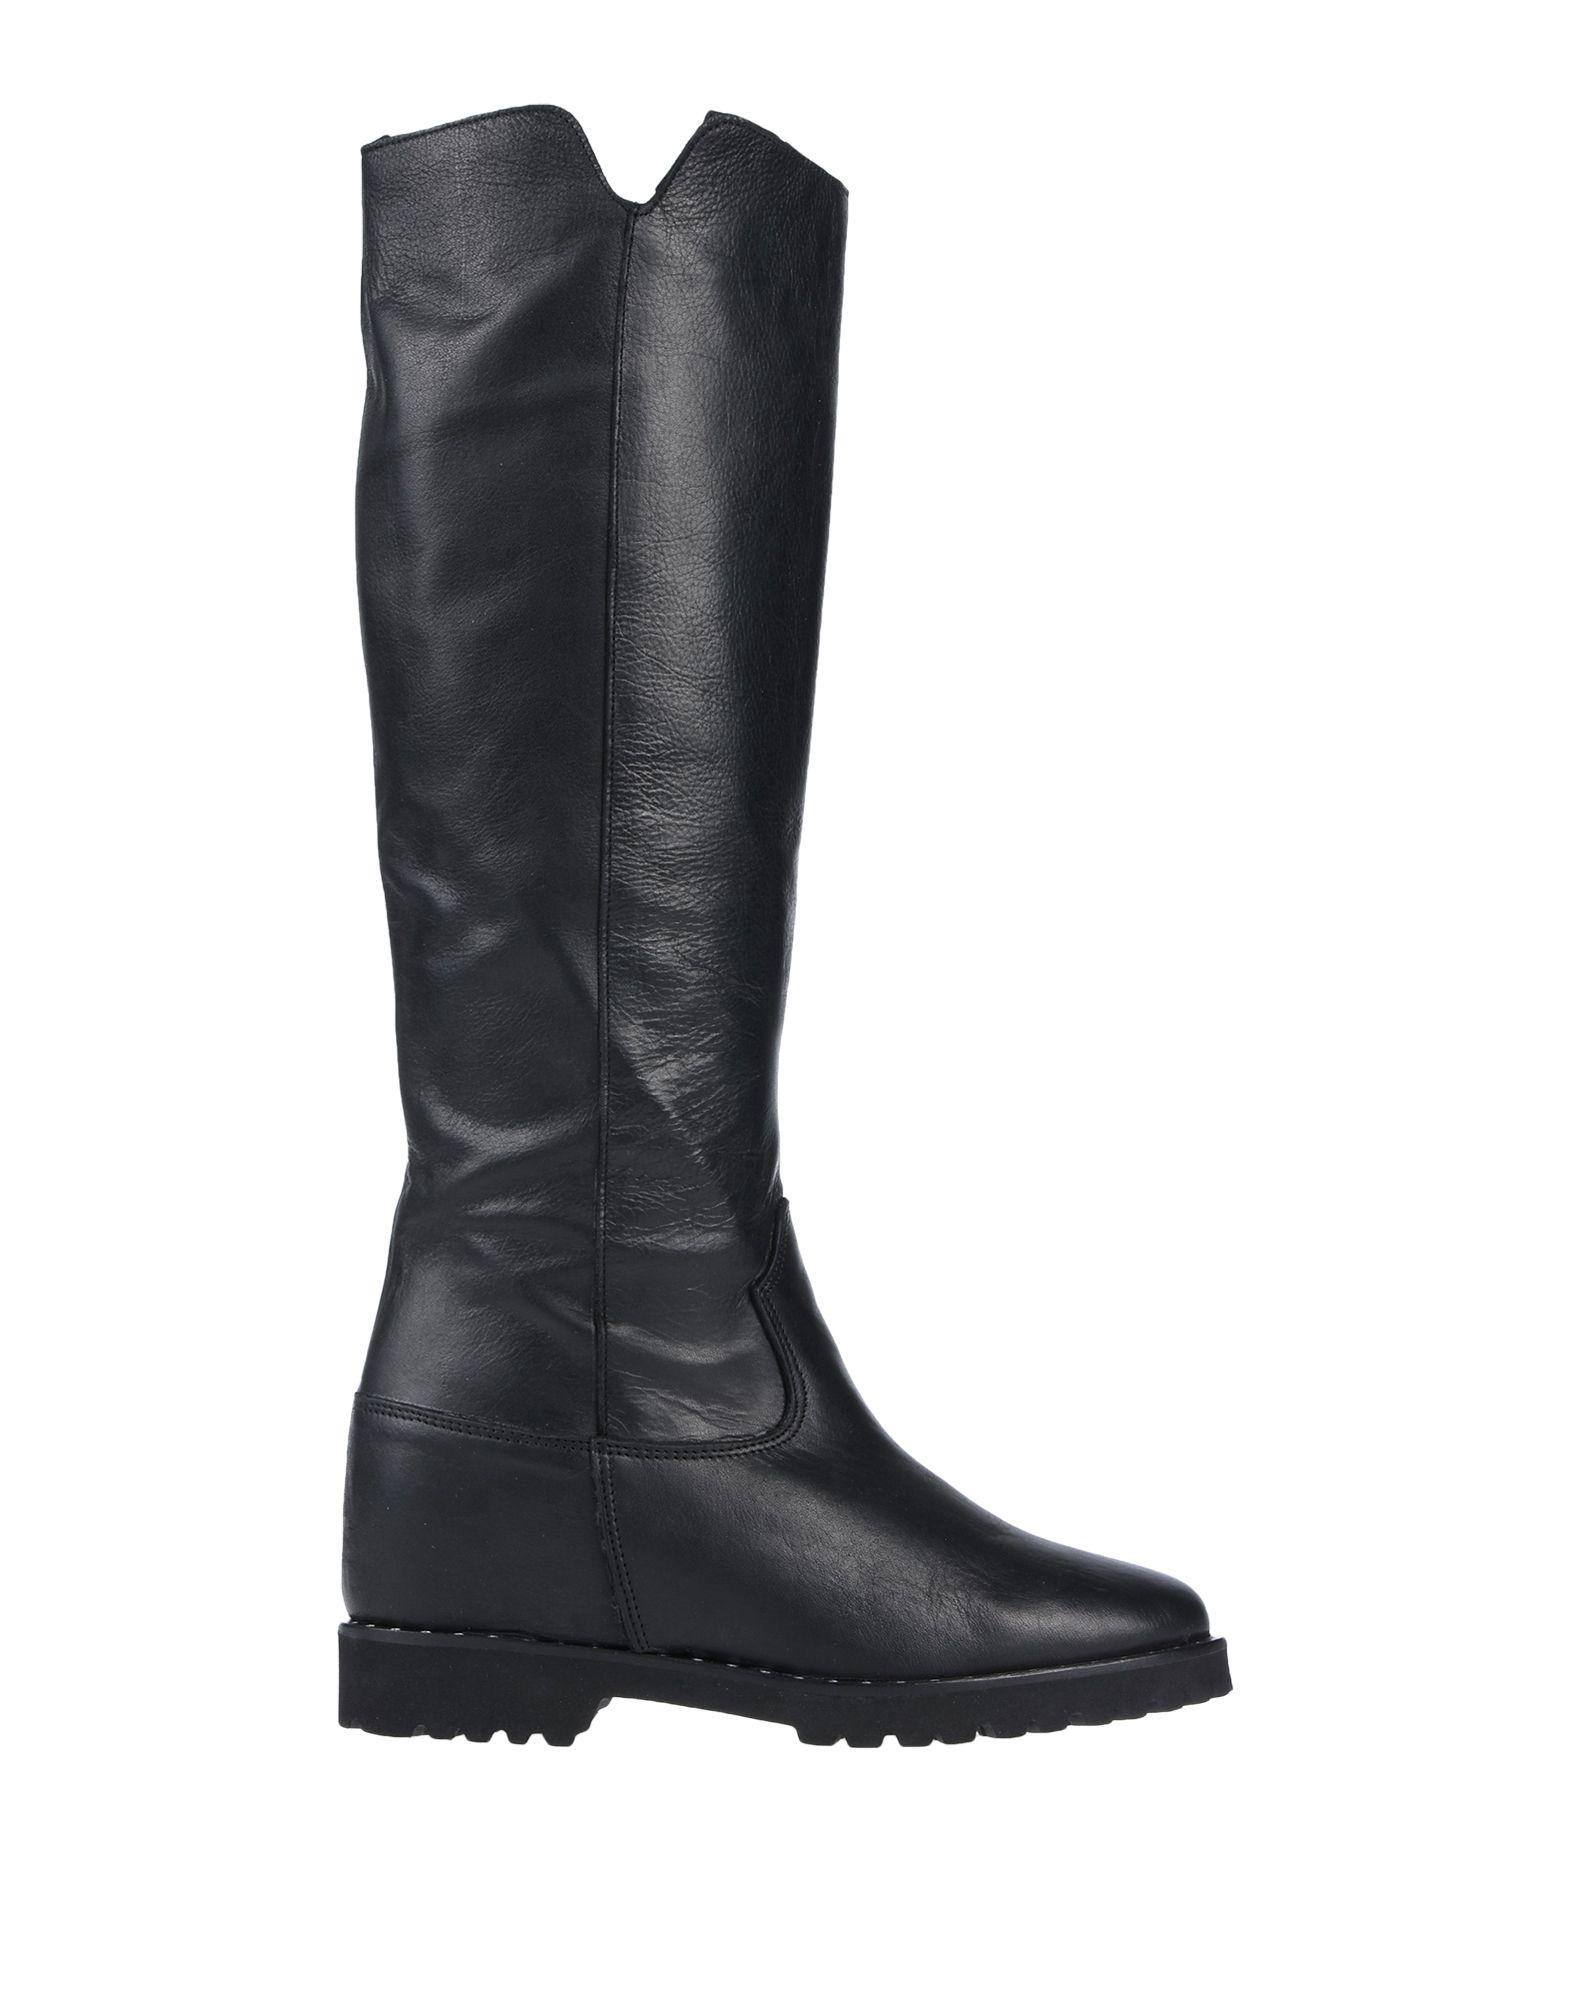 Stiefel Marina grau damen - 11709499LB